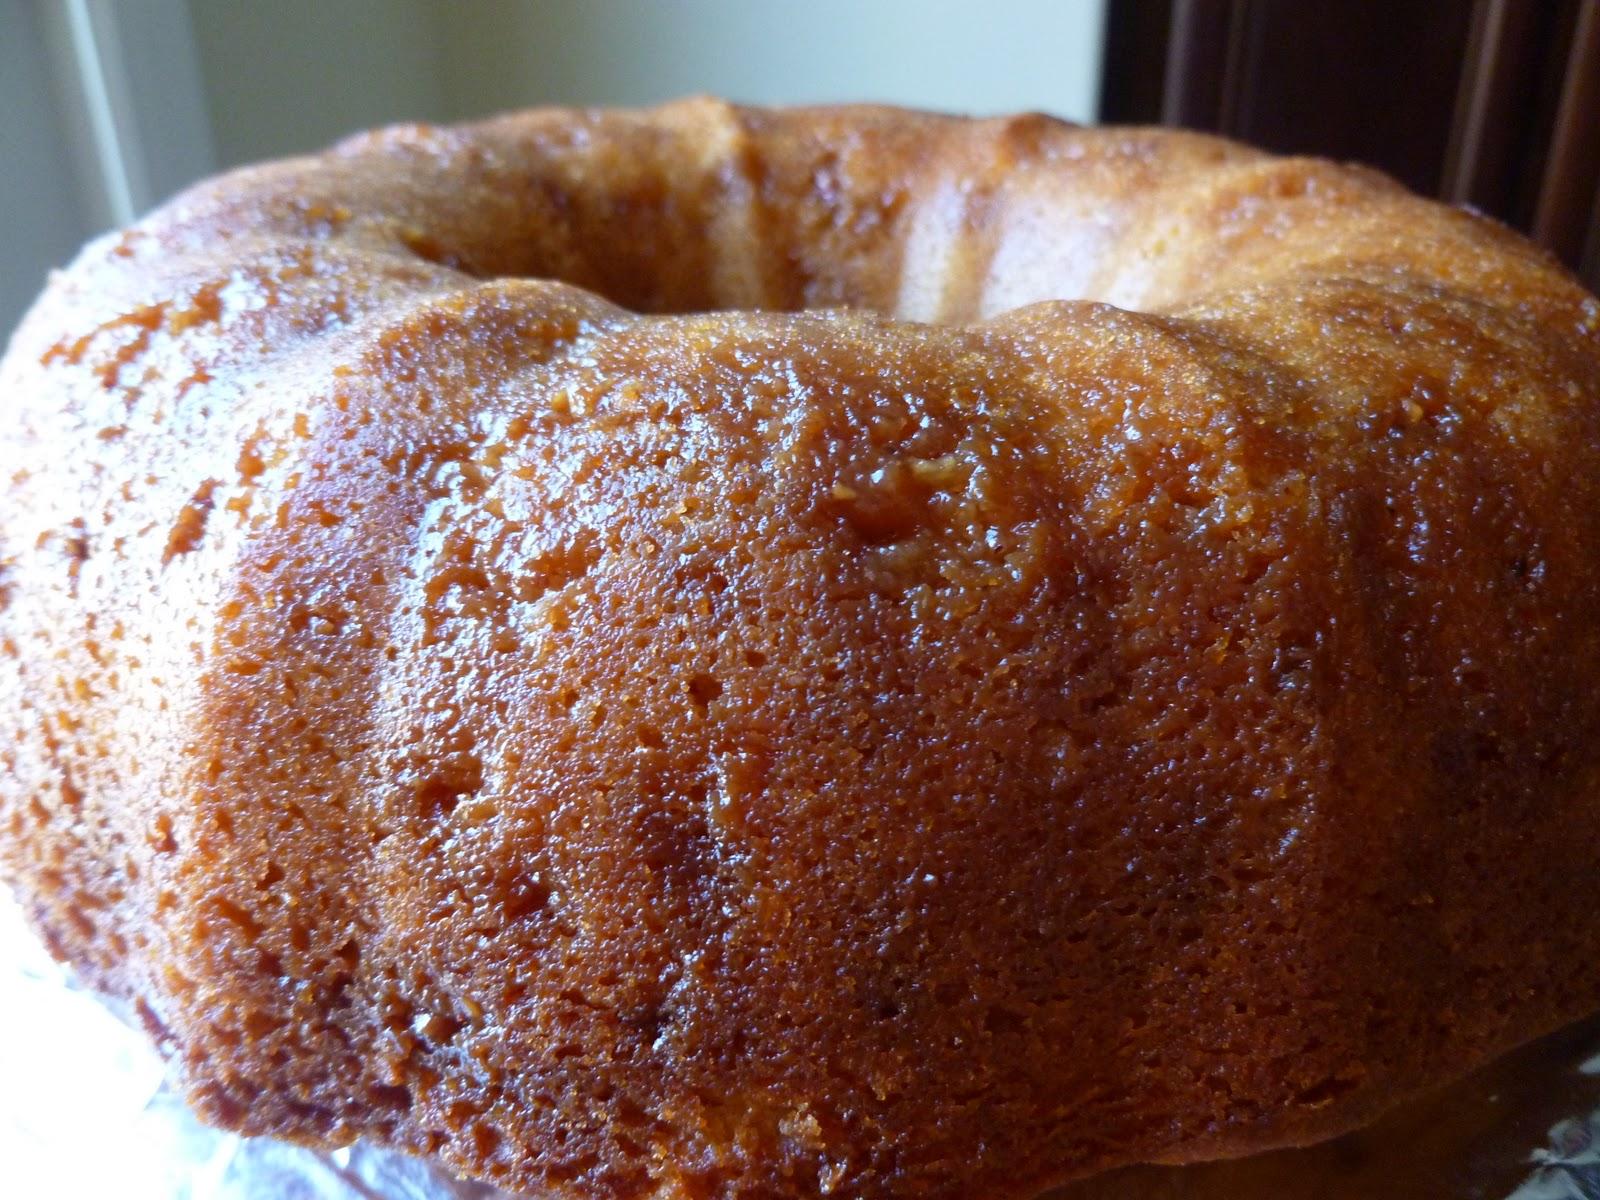 Cream Cheese Pound Cake Recipe Joy Of Baking: The Pastry Chef's Baking: Bake Sale Goodies